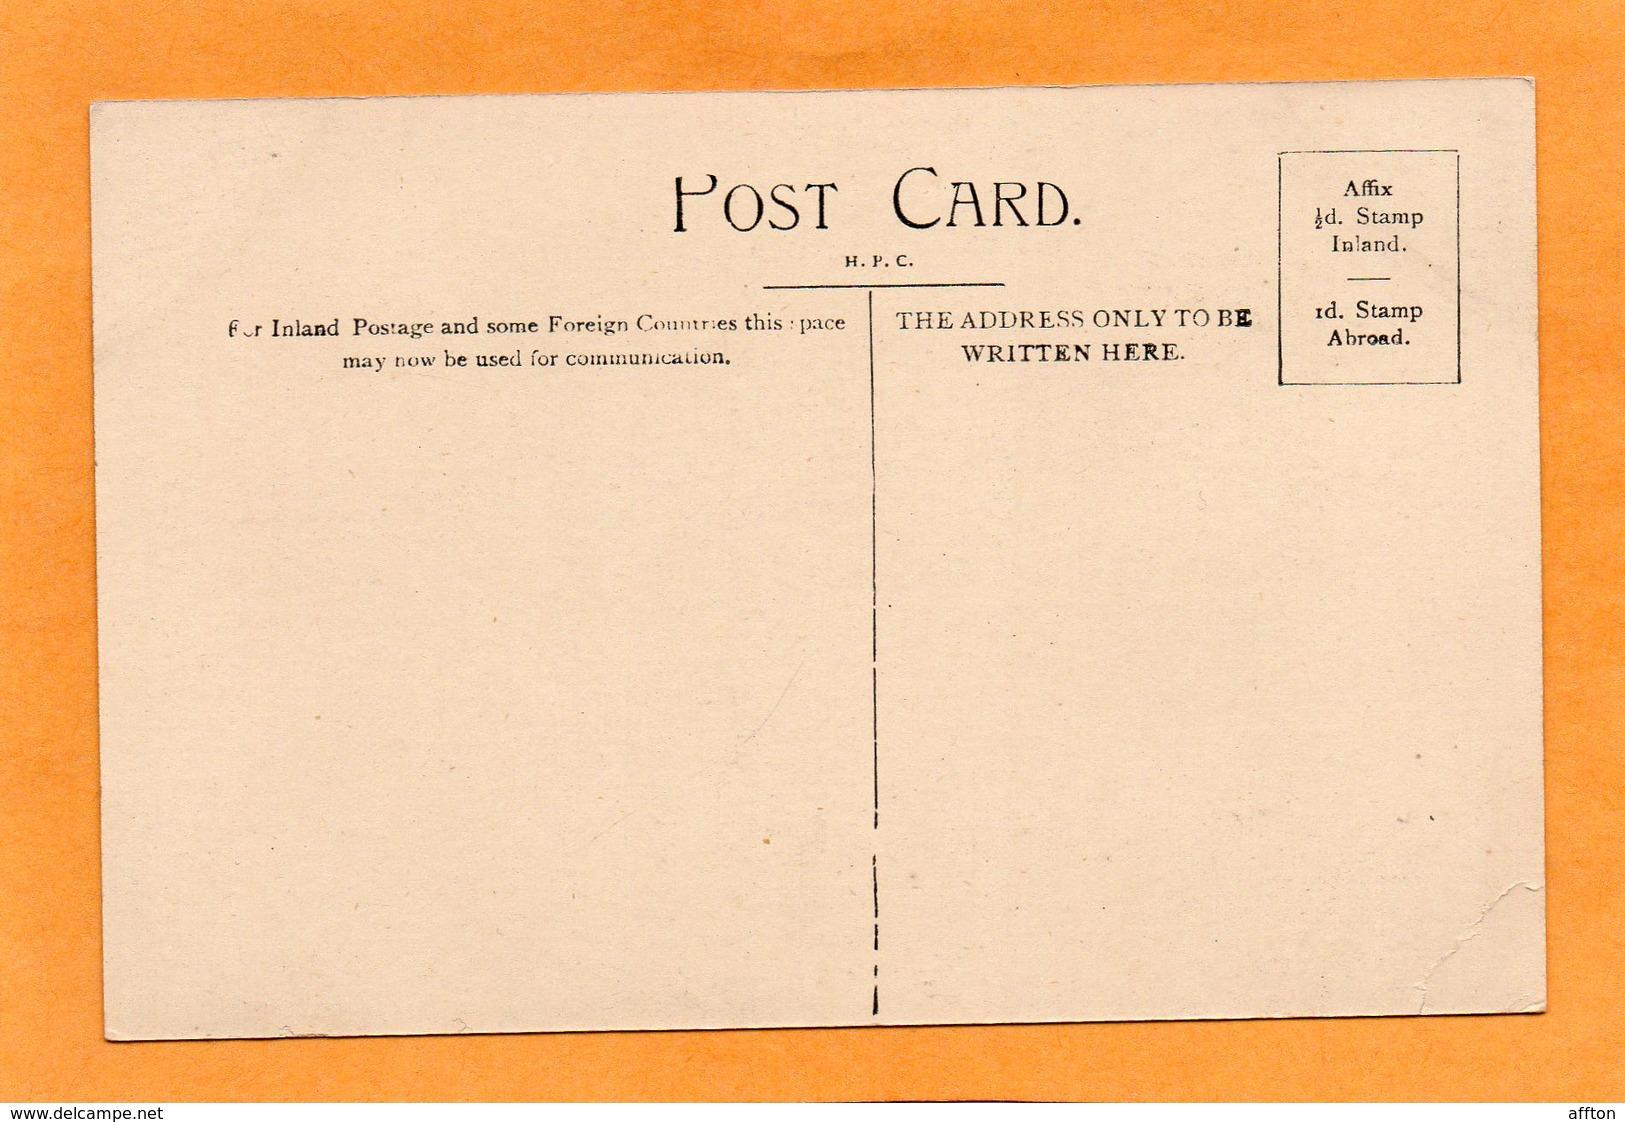 Antigua WI 1905 Postcard - Antigua & Barbuda